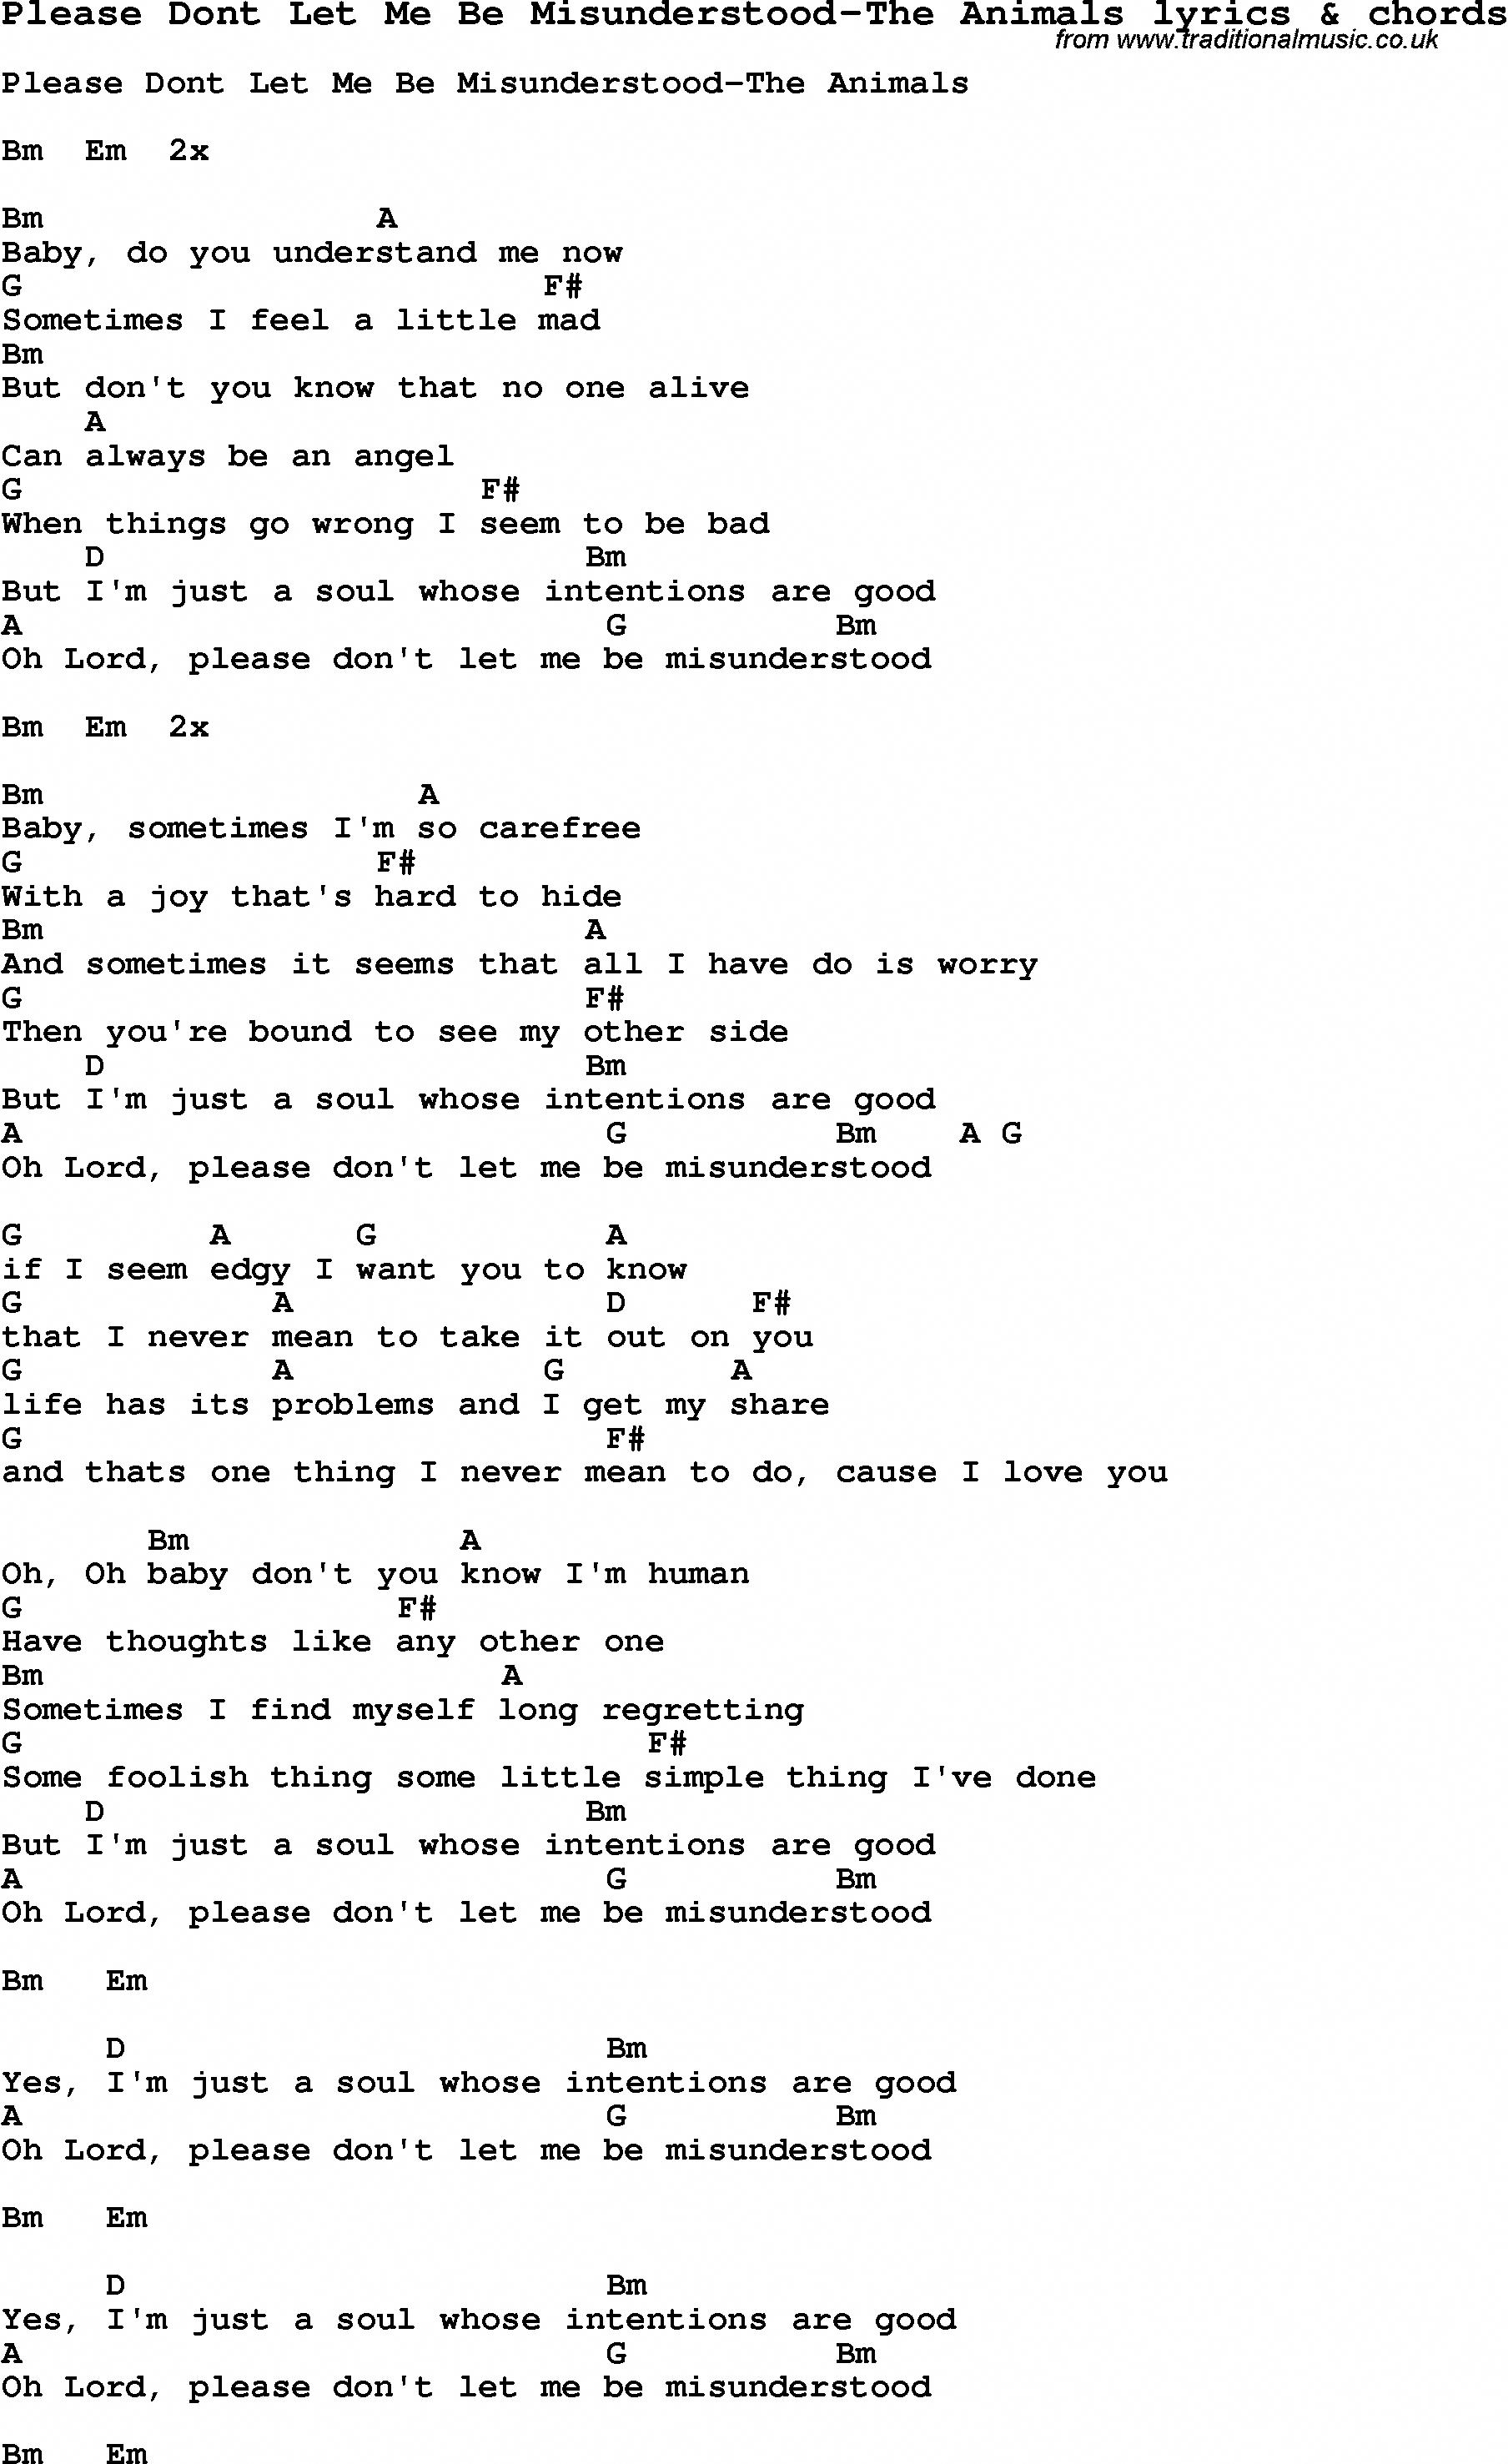 Love Song Lyrics forPlease Dont Let Me Be Misunderstood The ...